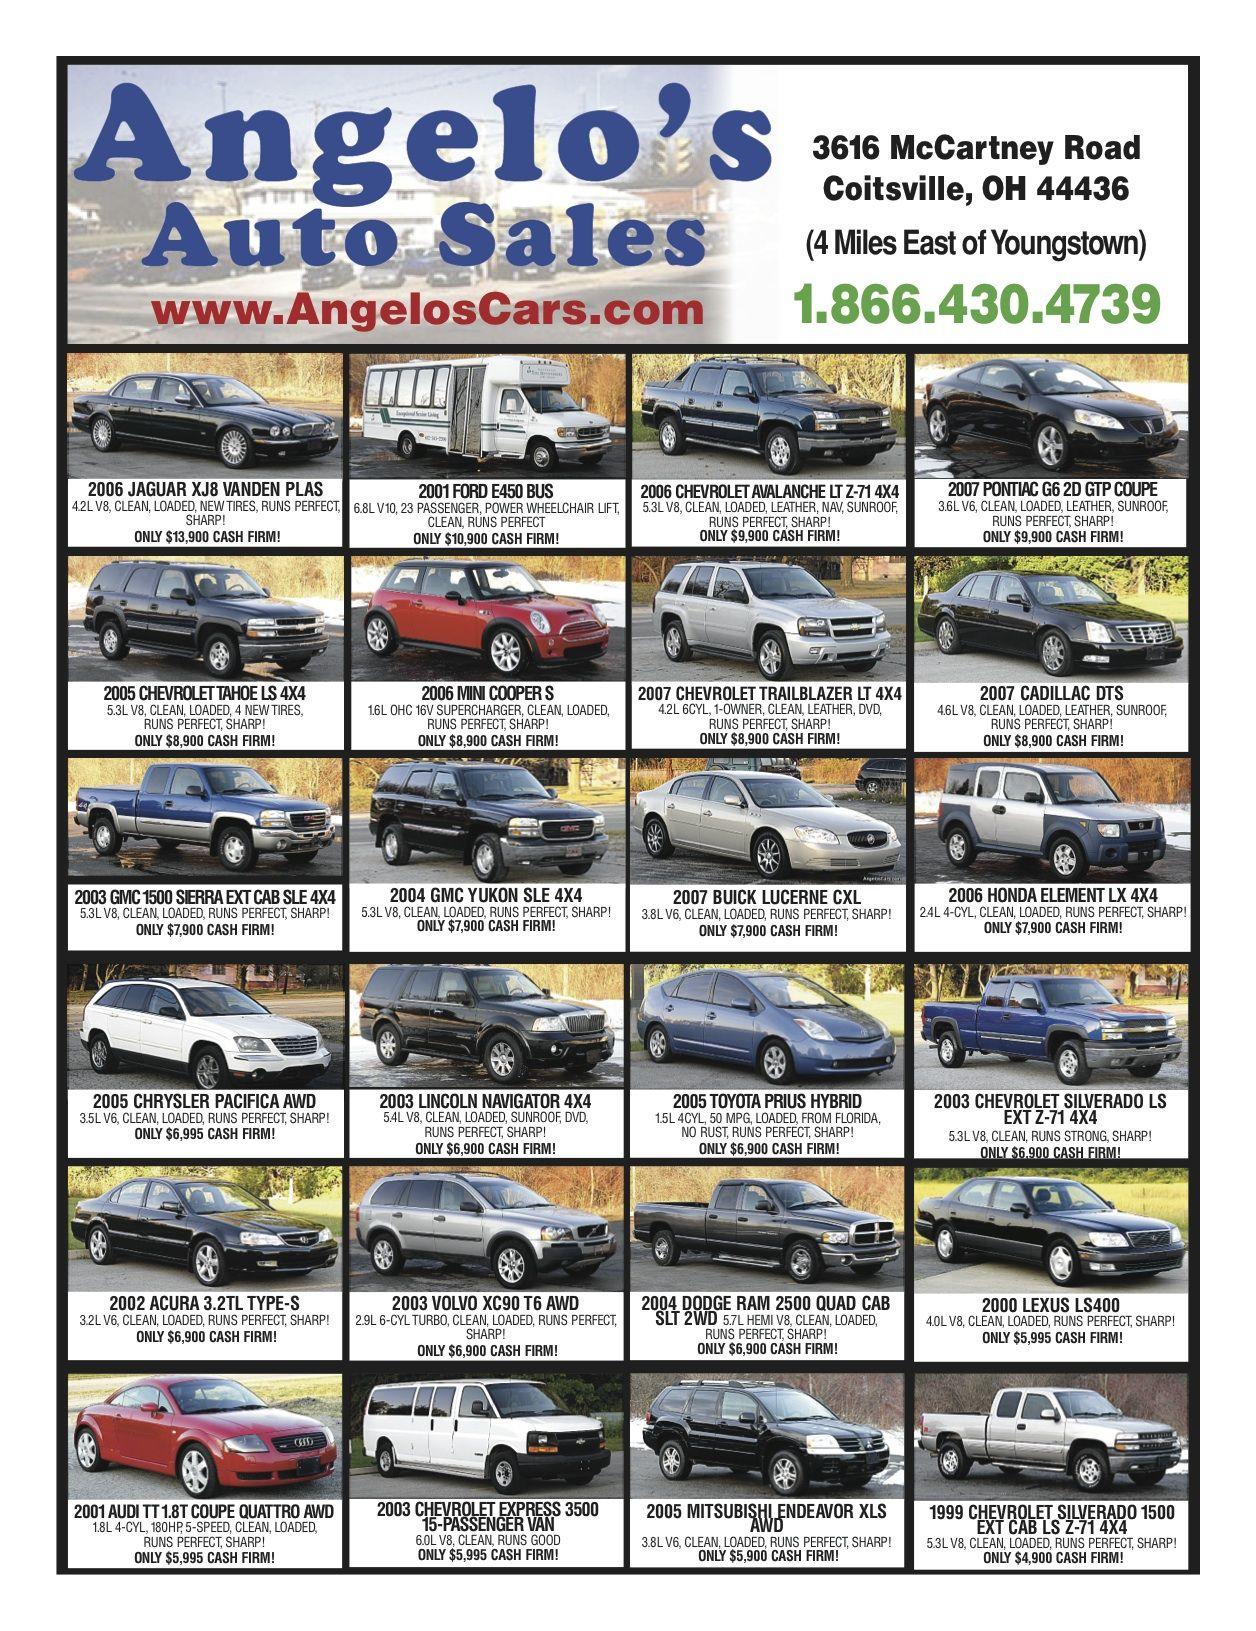 Angelos Auto Sales >> Angelo S Auto Sales Drive Magazine Issue 5 2013 Bmw